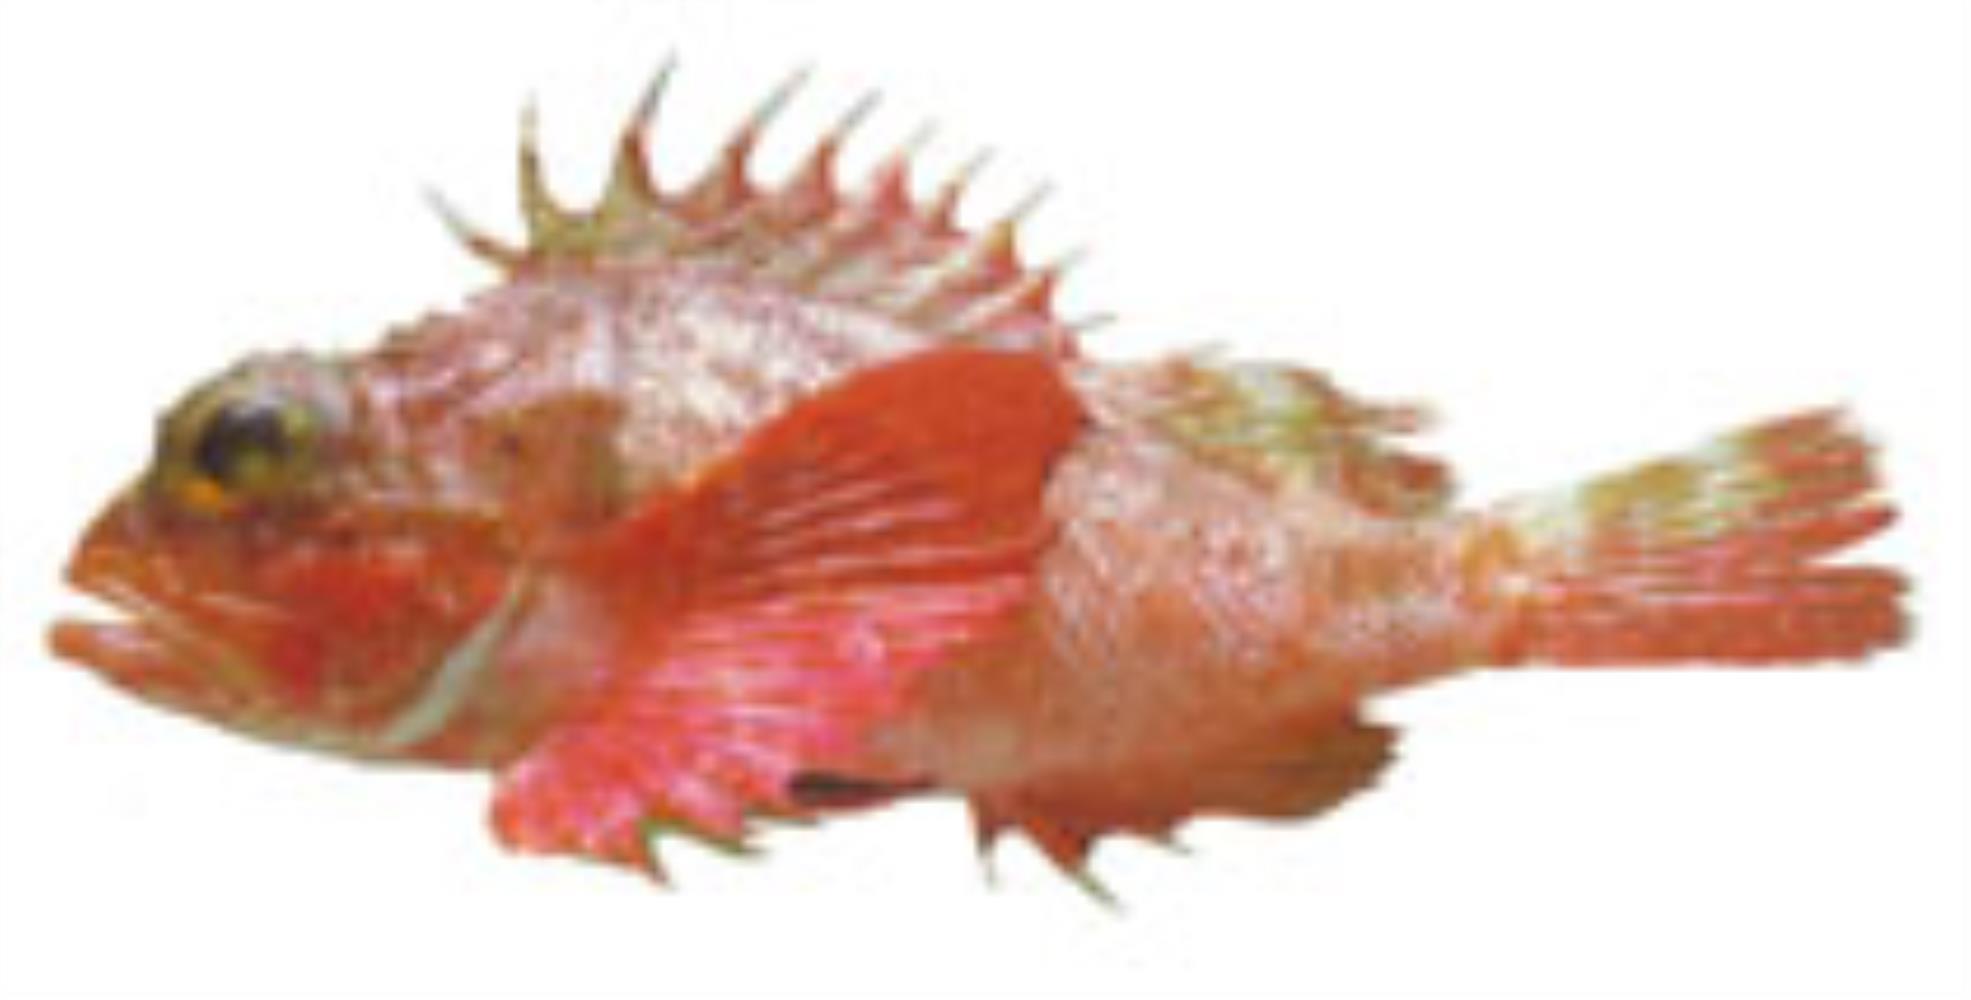 Longfin Scorpionfish